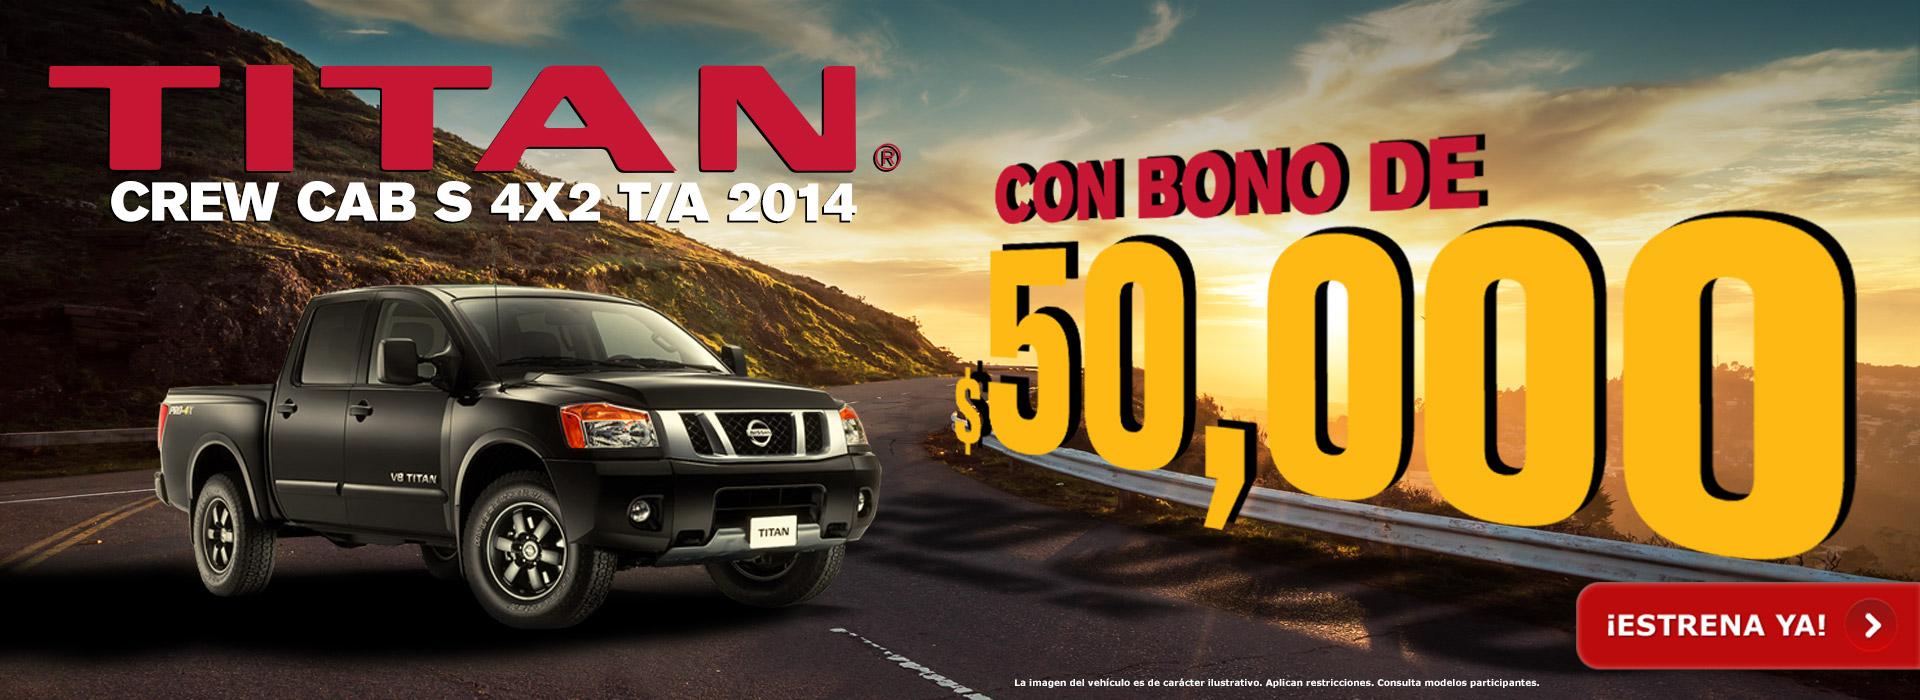 Titan Crew Cab 2014 con bono de $50,000